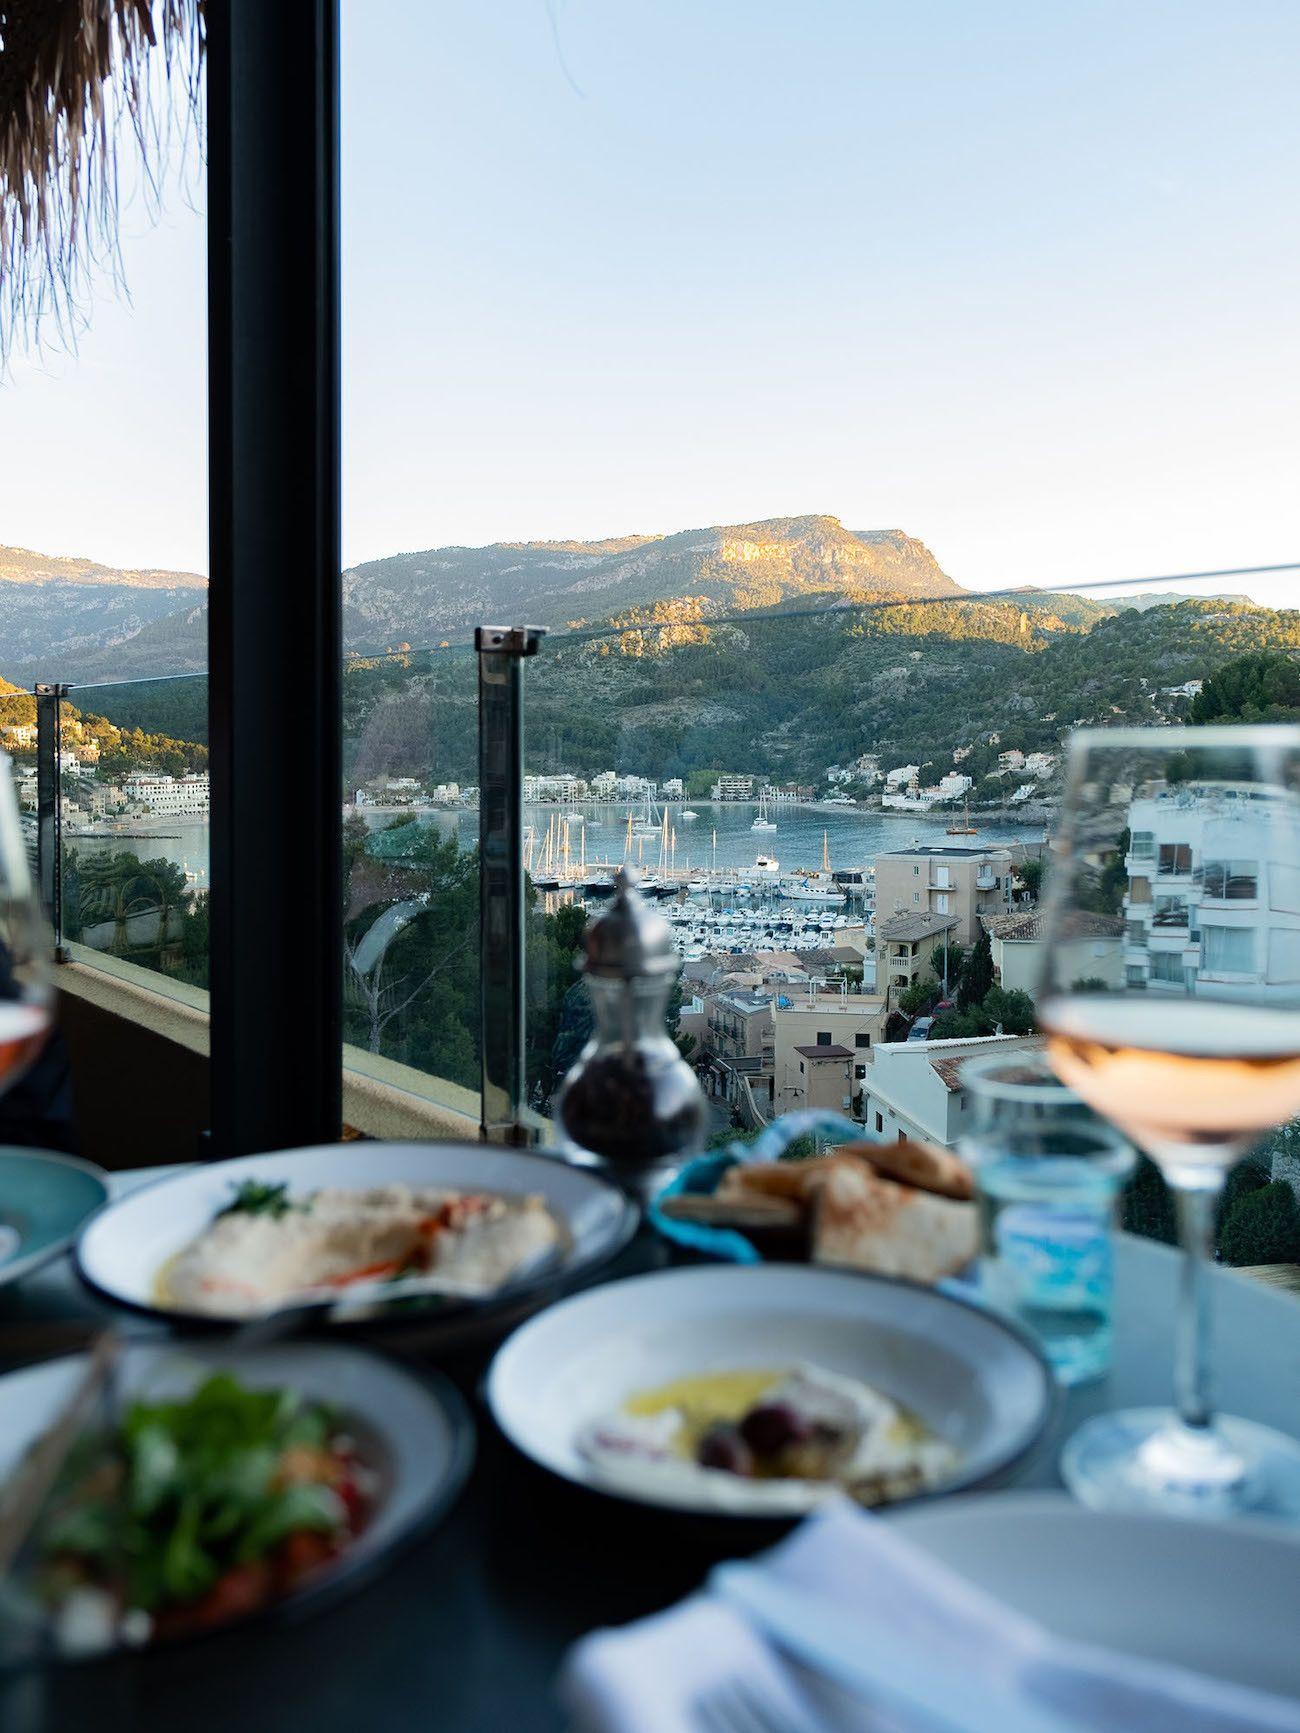 Foodblog About Fuel, Bikini Island & Mountain Hotels, Dinner, Wein